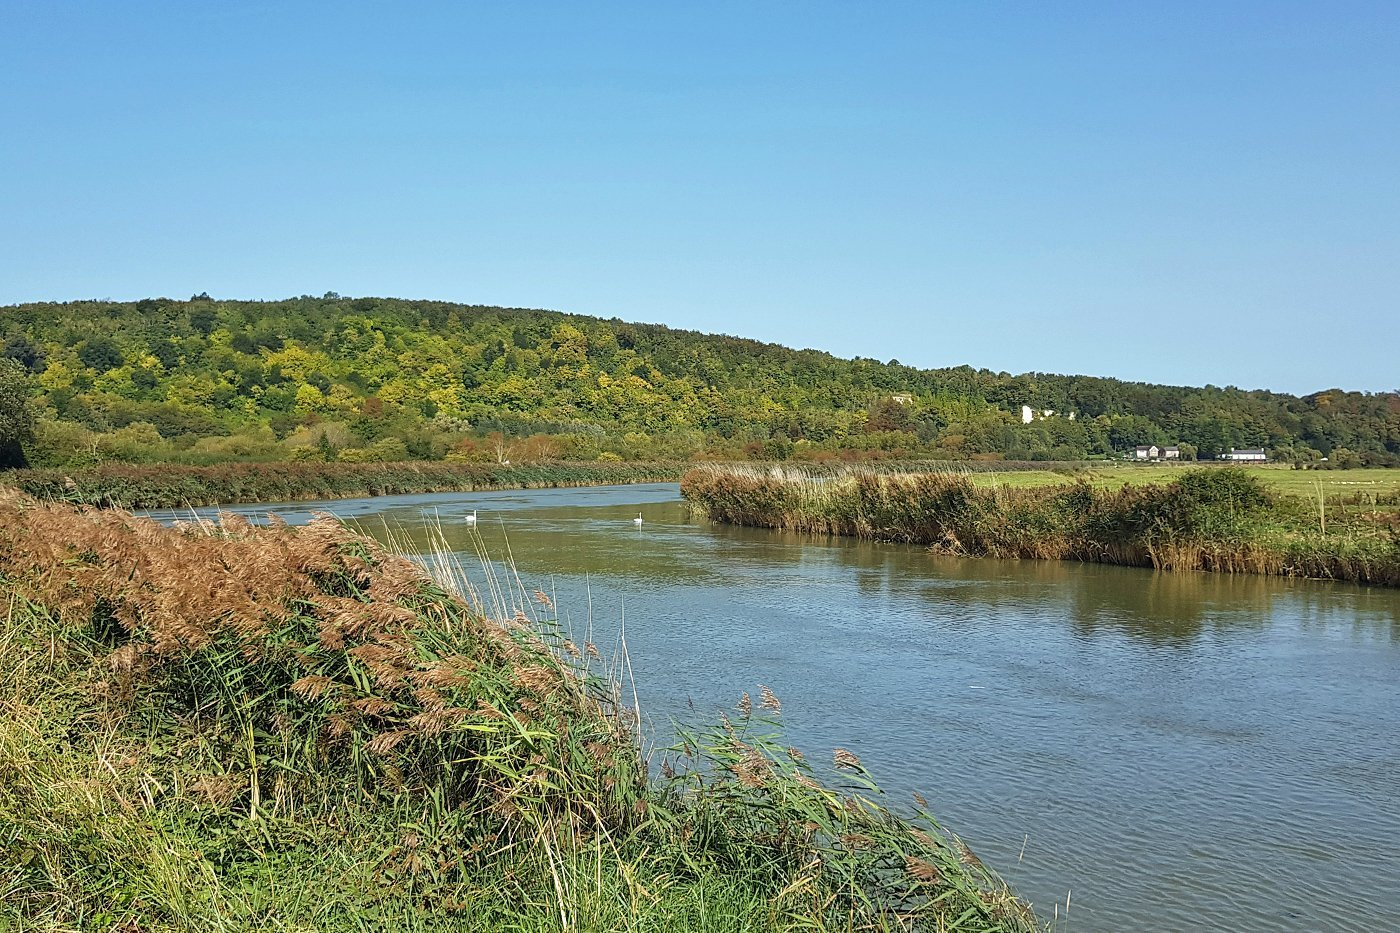 The River Arun, Arundel